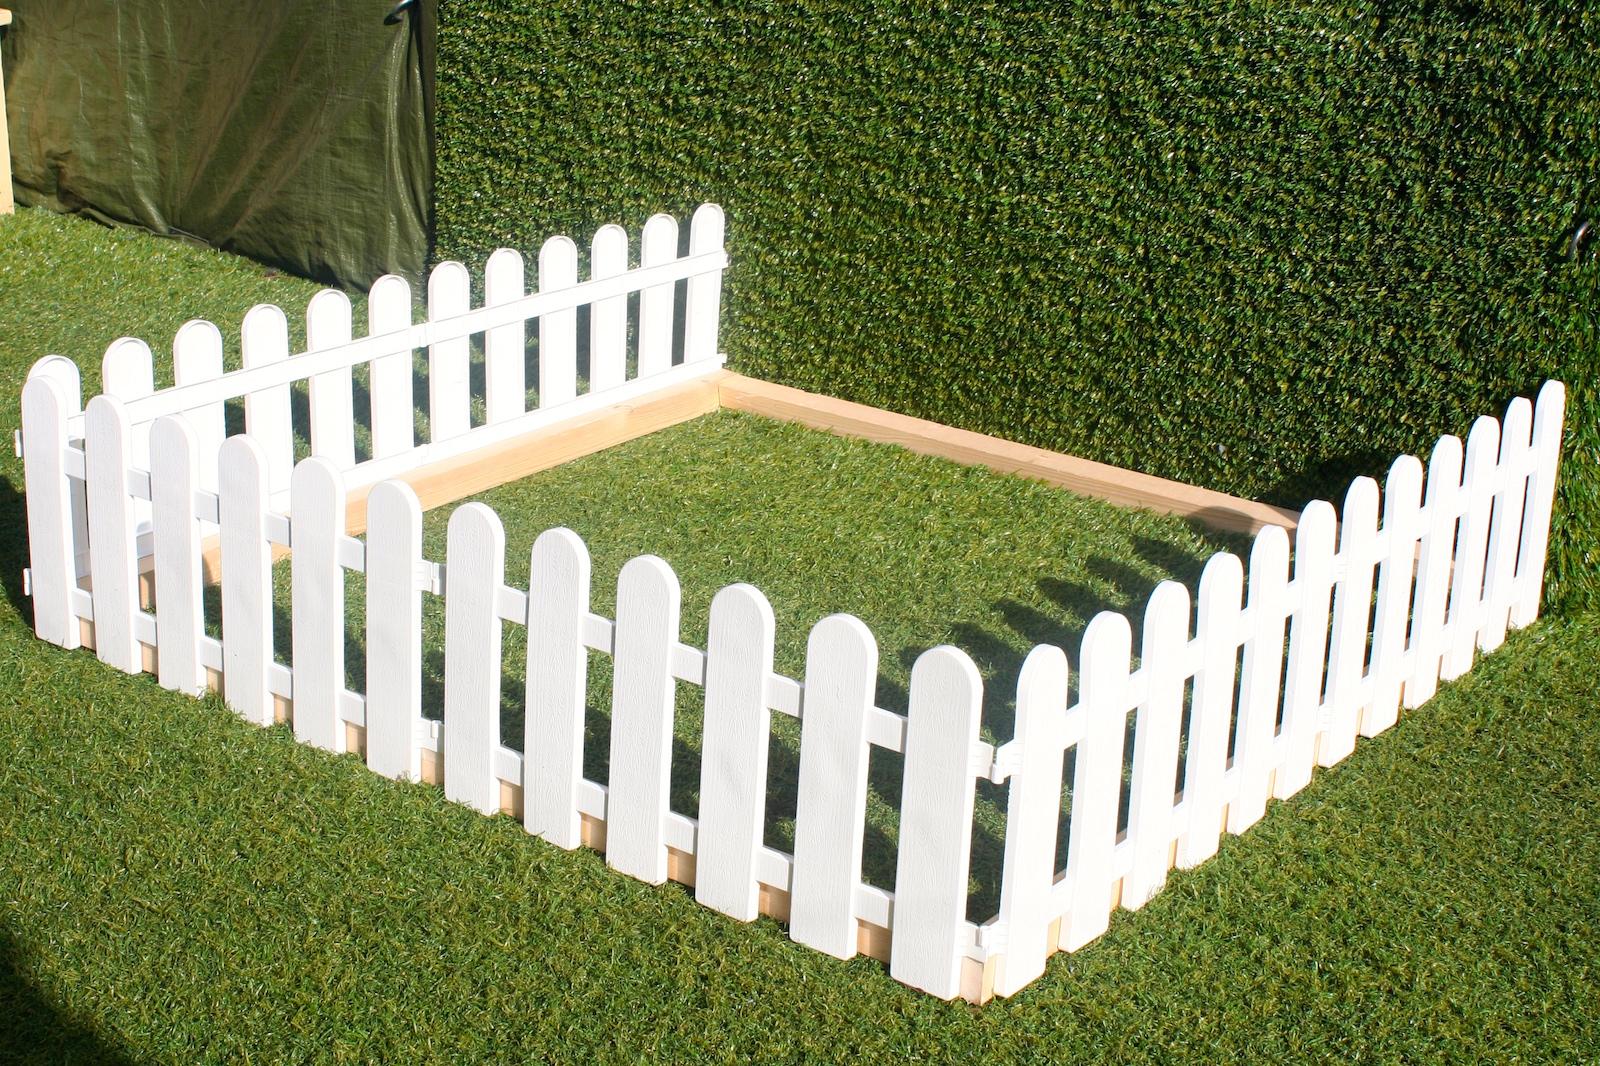 Plastic Fencing Lawn Grass Border Path Grave Edging Fancy